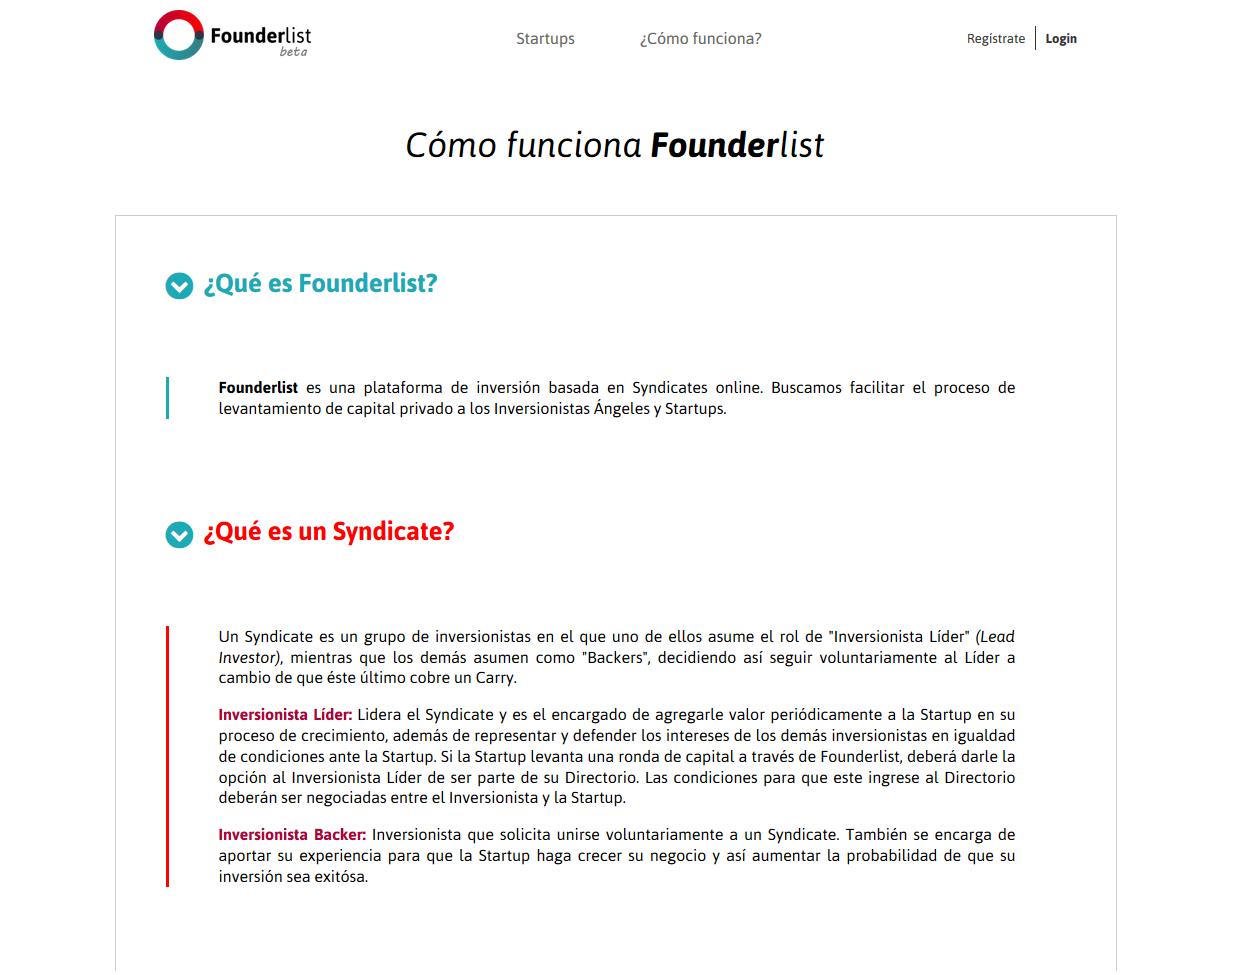 Founderlist App Screenshot: How it works screen